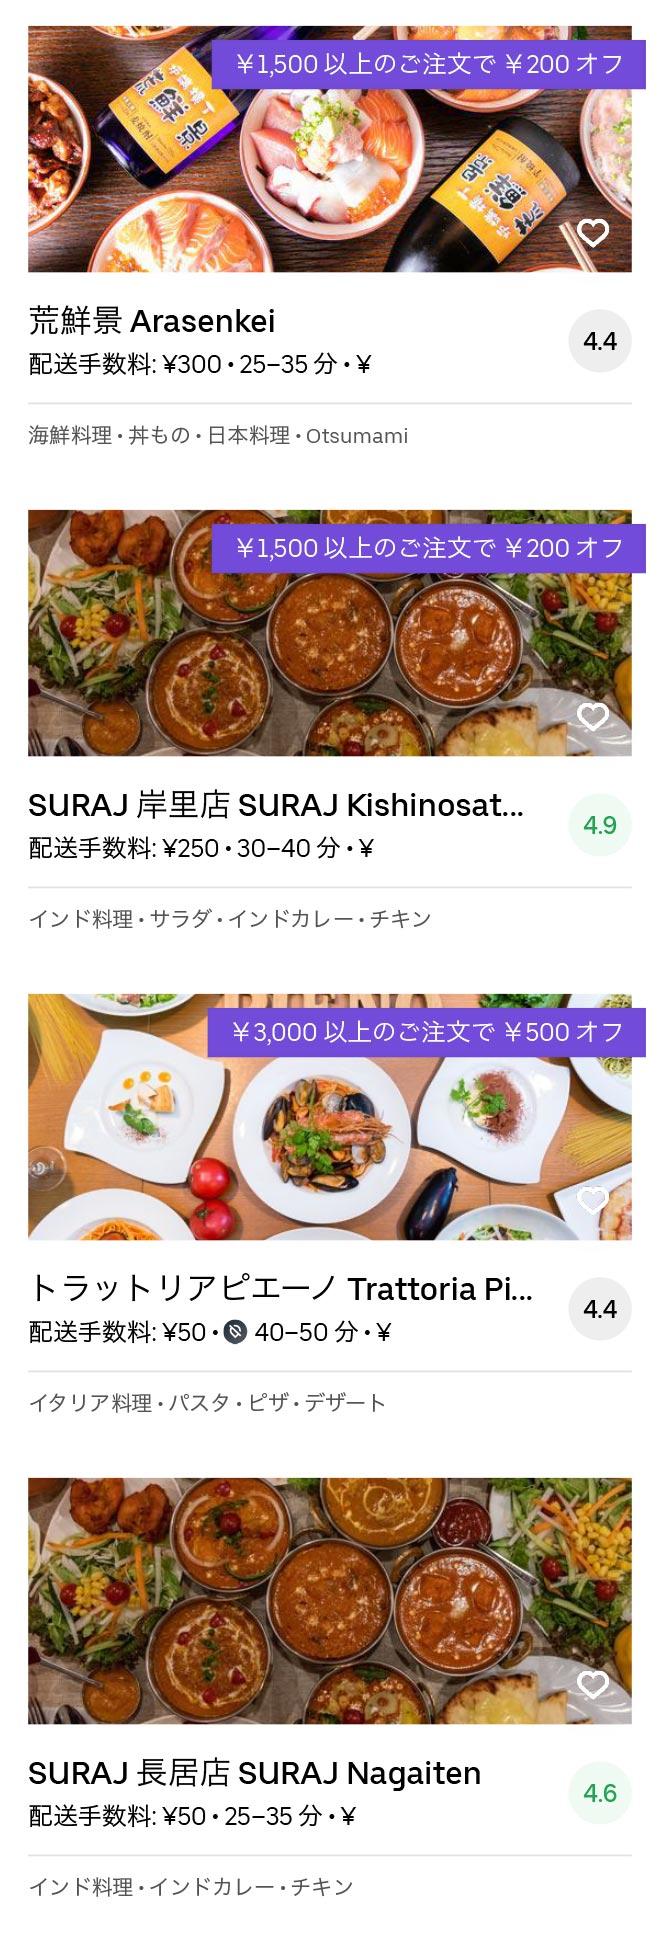 Osaka harinakano menu 2005 05